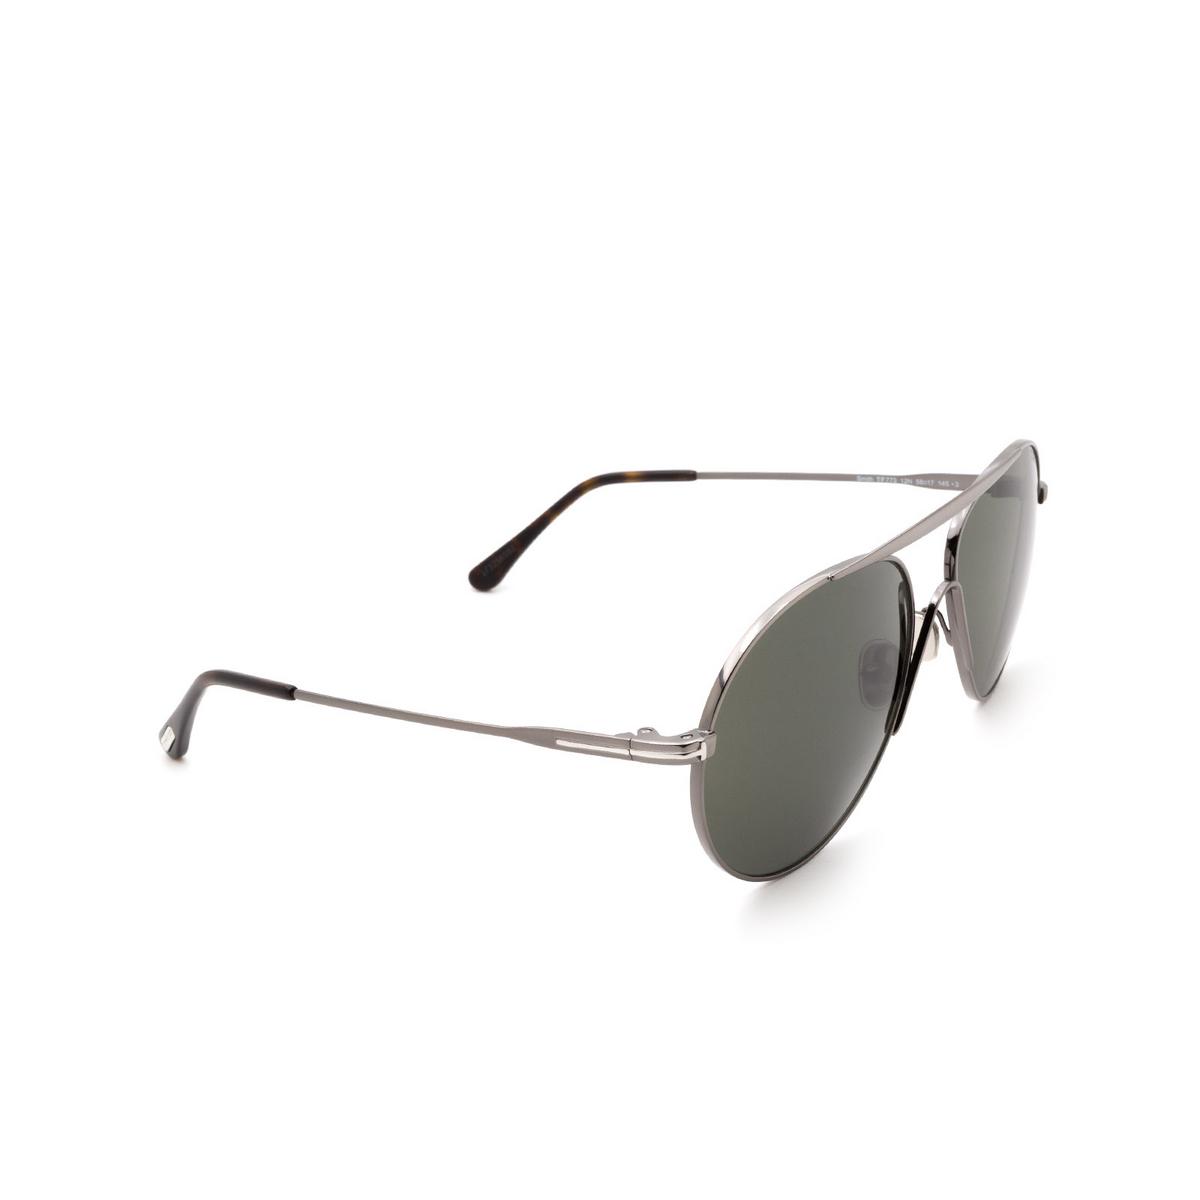 Tom Ford® Aviator Sunglasses: Smith FT0773 color Shiny Dark Ruthenium 12N - three-quarters view.